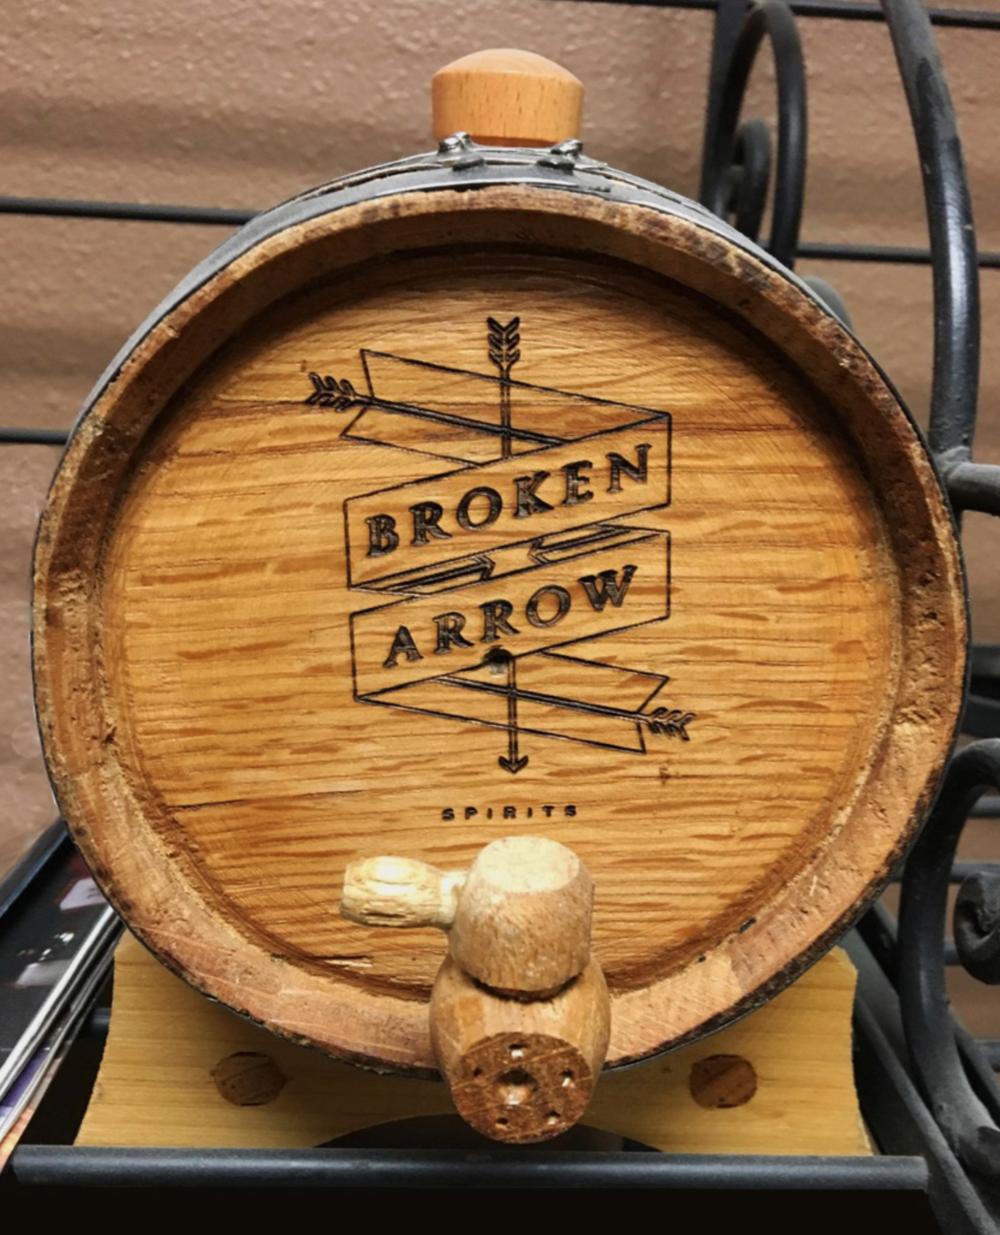 Broken Arrow Spirits